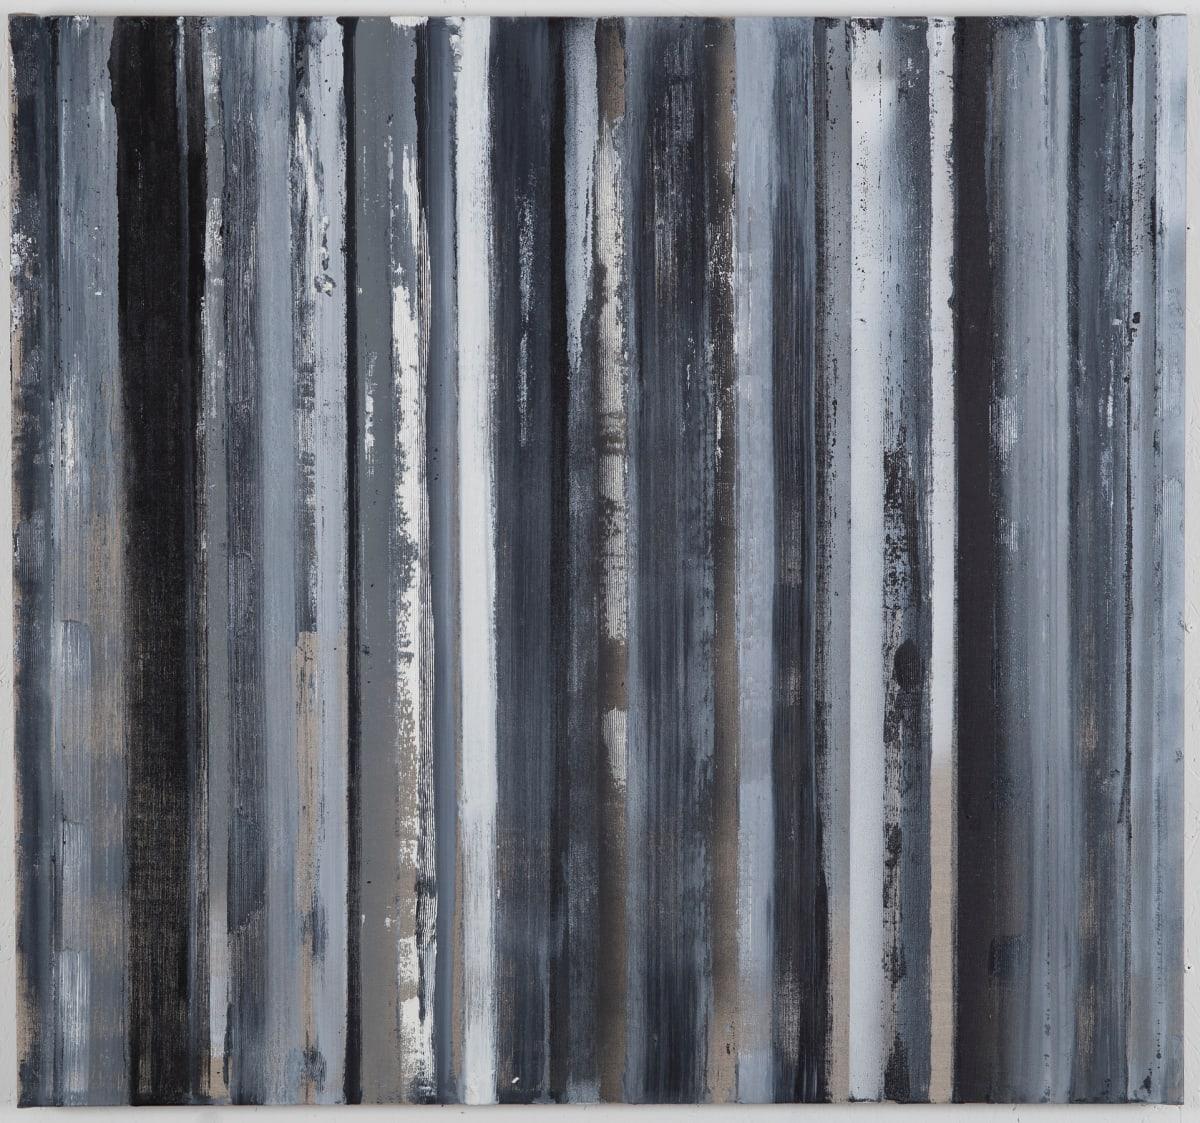 RW 152 (Curtain) by Jeff Perrott